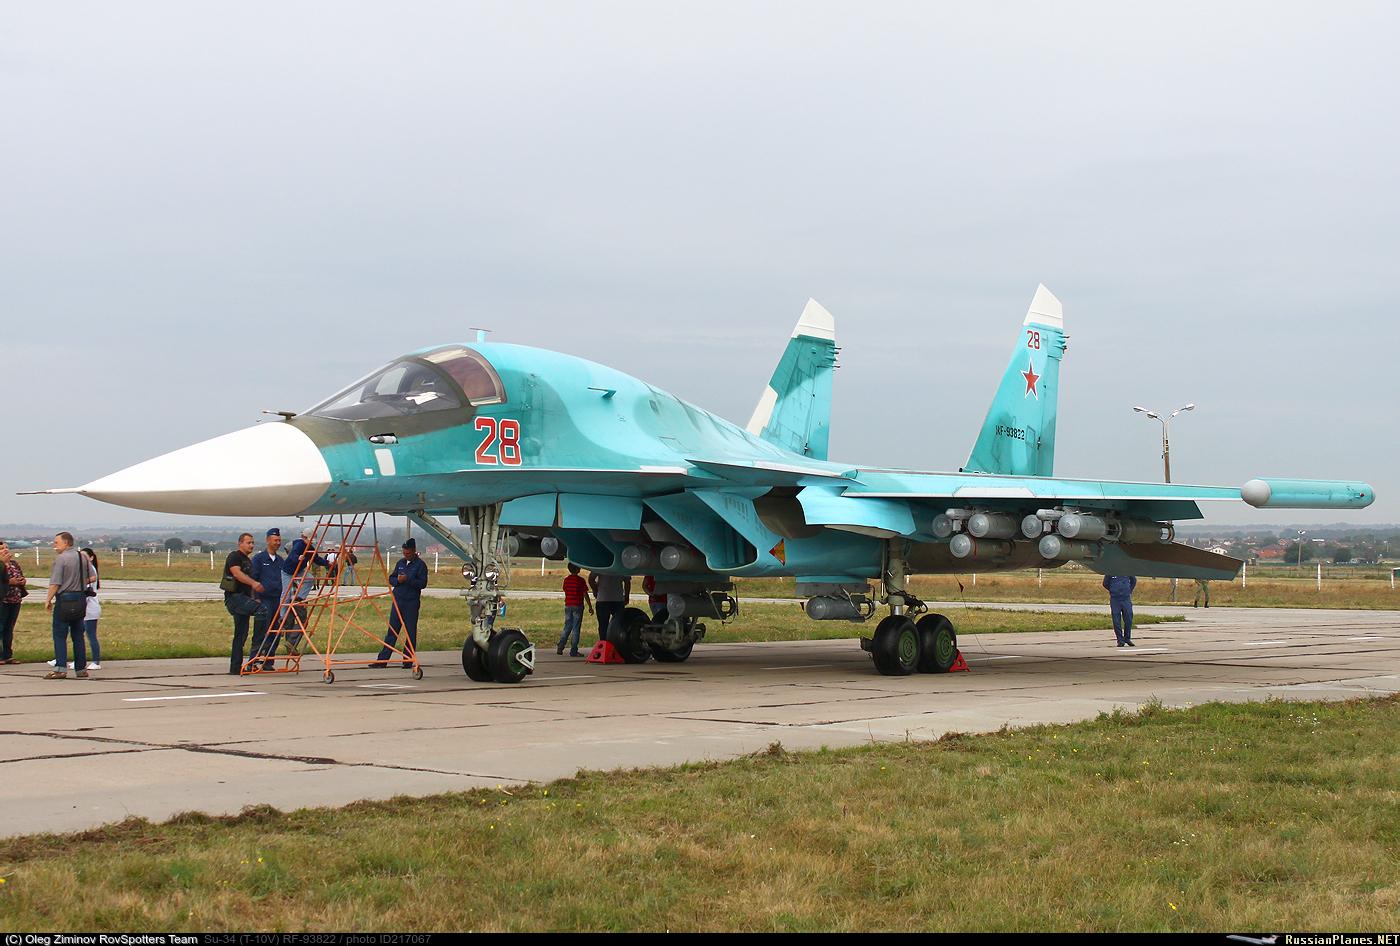 https://russianplanes.net/images/to218000/217067.jpg